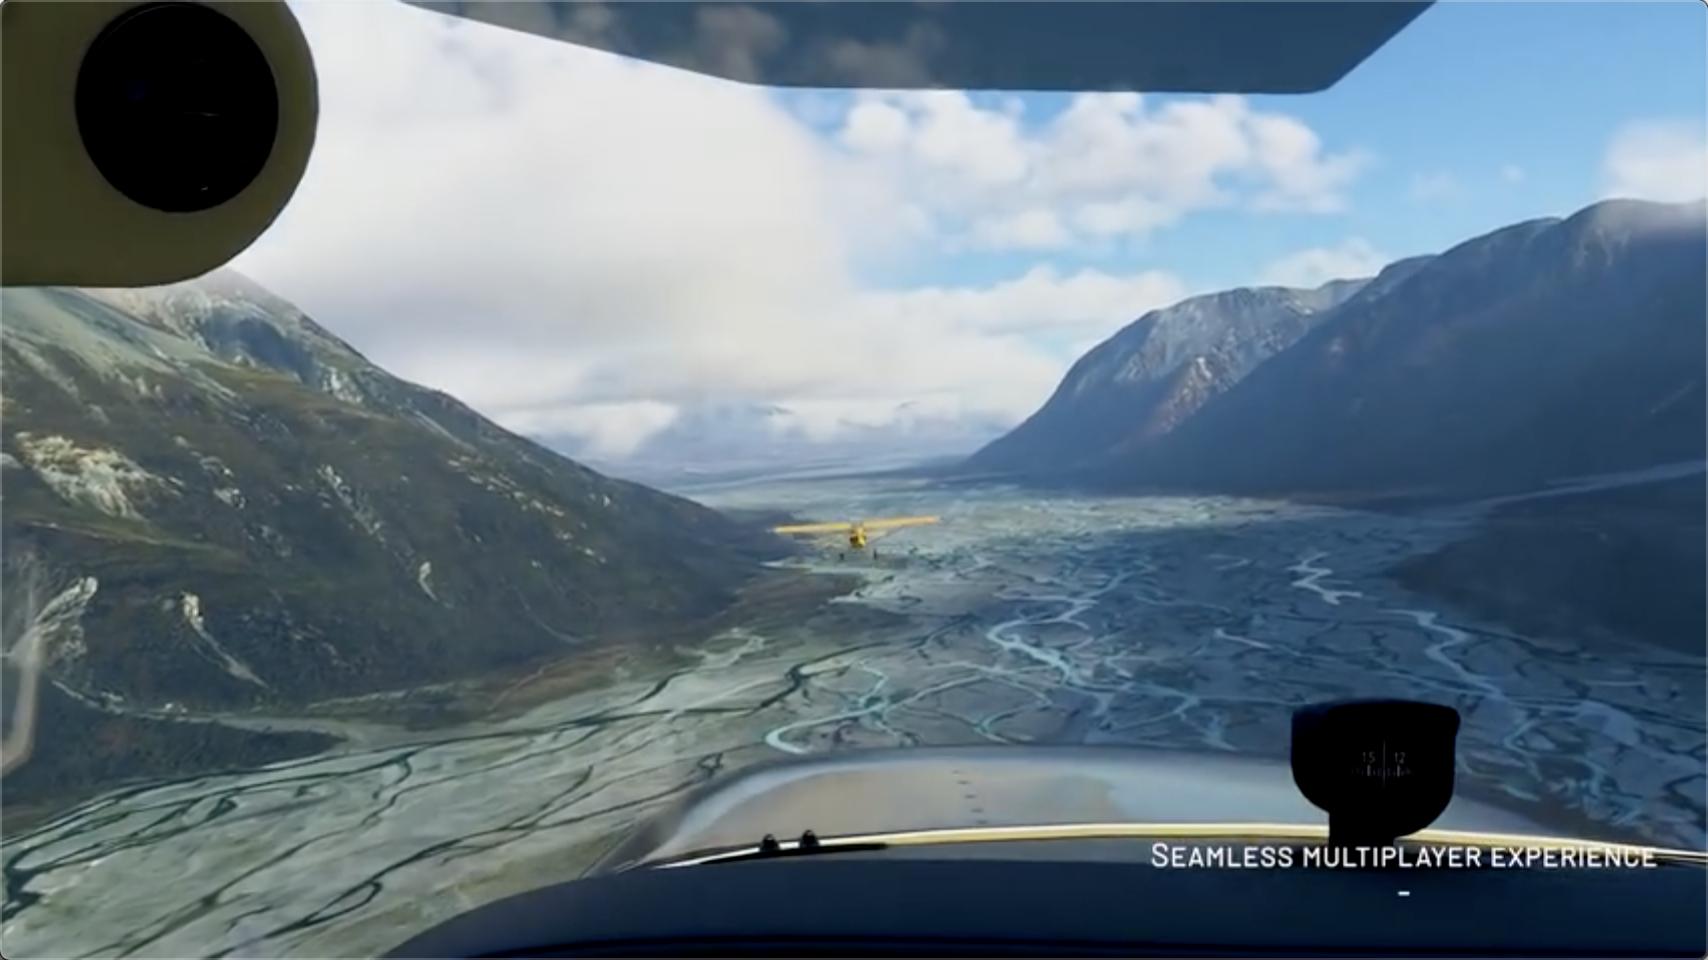 微软飞行模拟2020/Microsoft Flight Simulator插图5